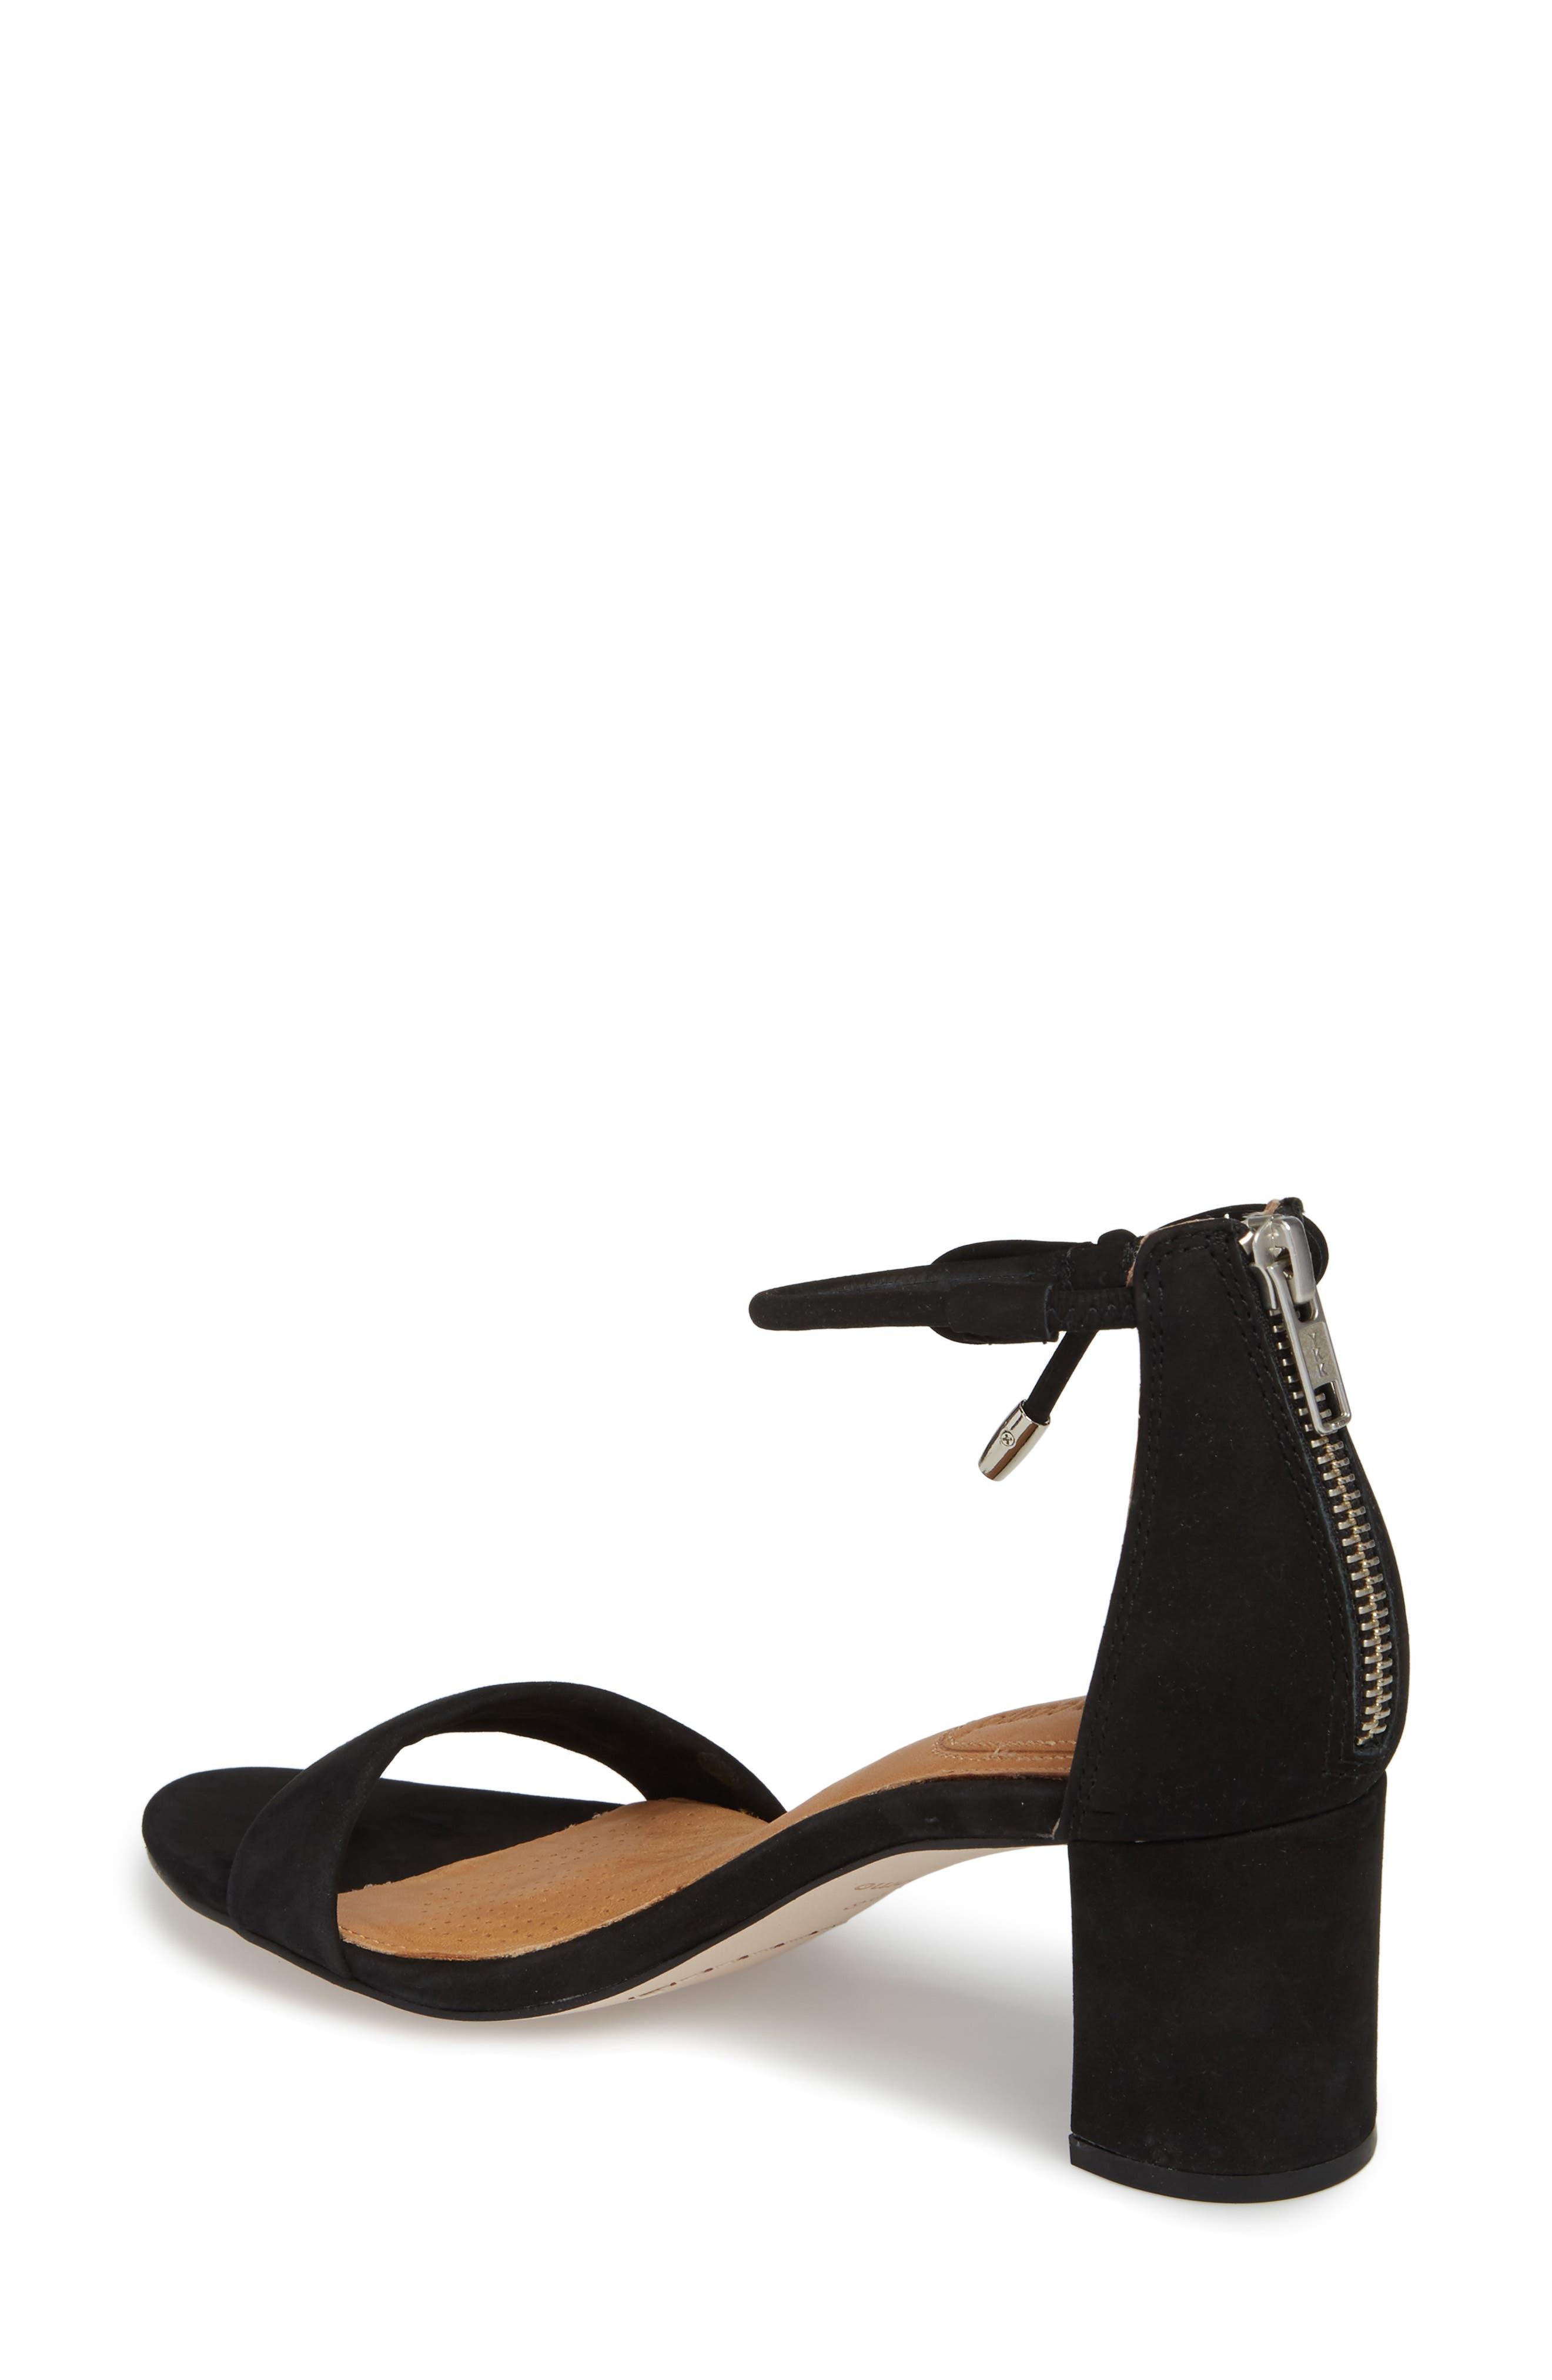 Celebratt Ankle Strap Sandal,                             Alternate thumbnail 2, color,                             BLACK NUBUCK LEATHER